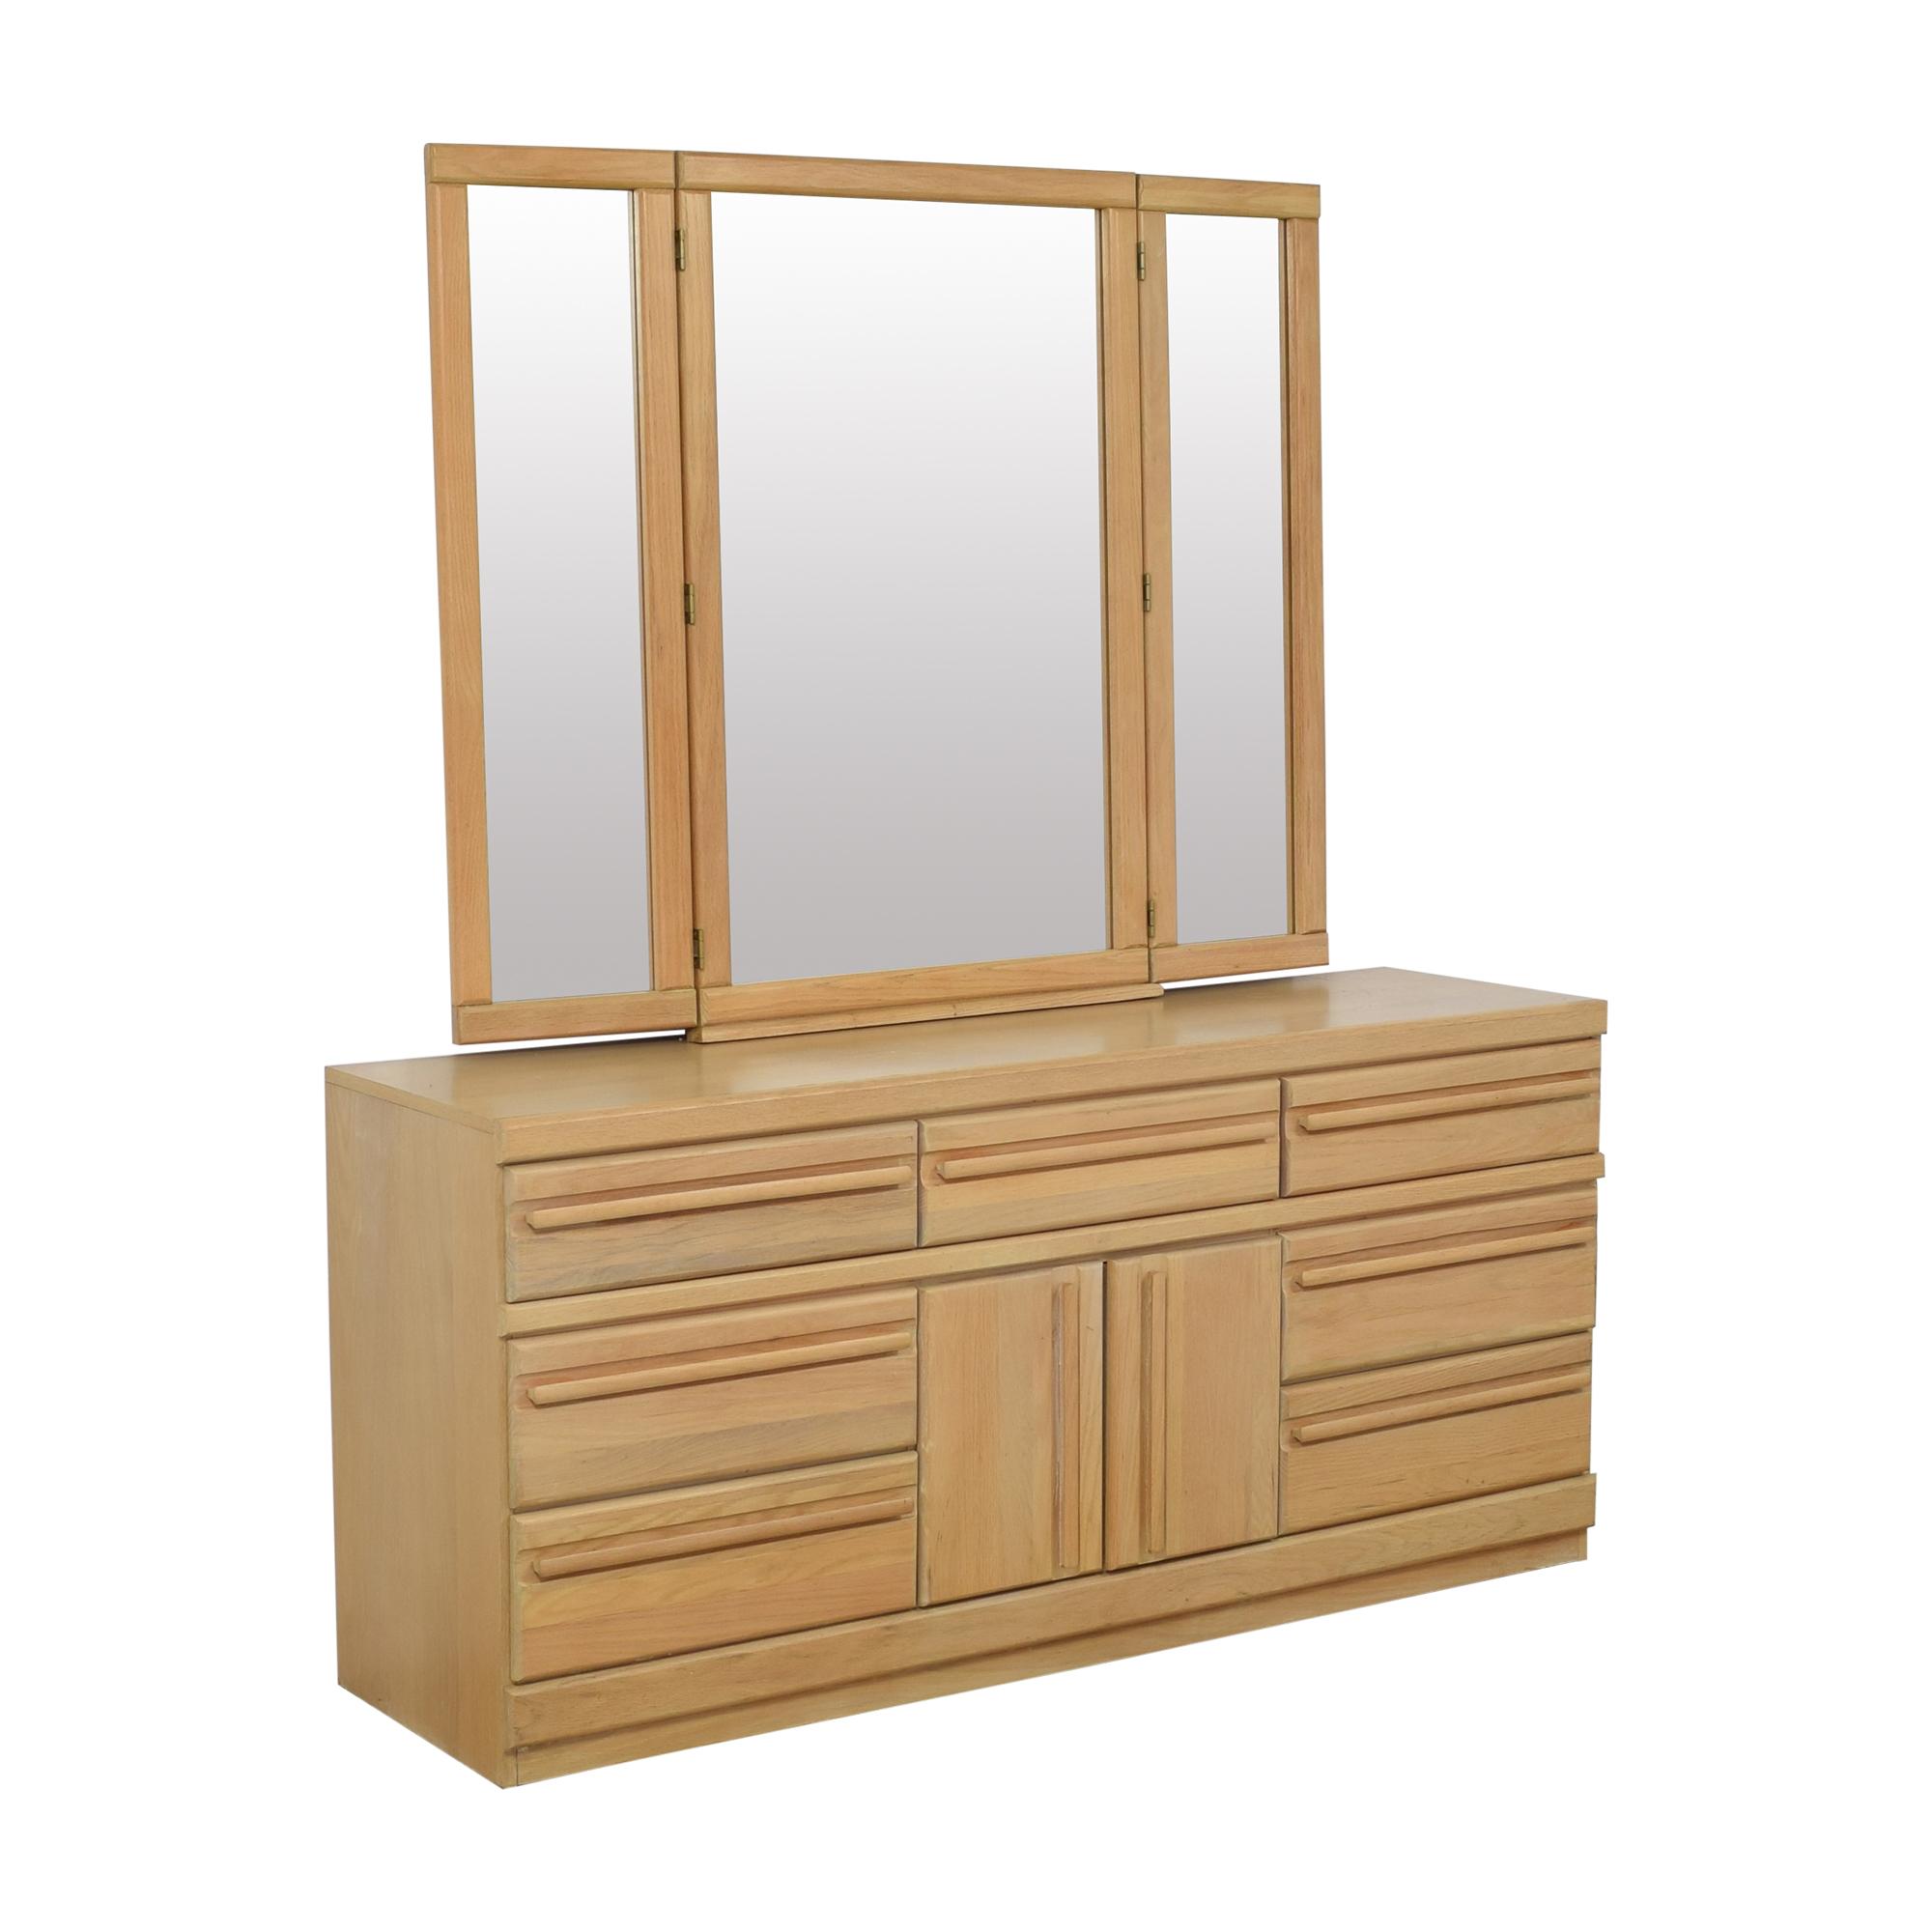 buy Broyhill Furniture Broyhill Triple Dresser with Mirror online